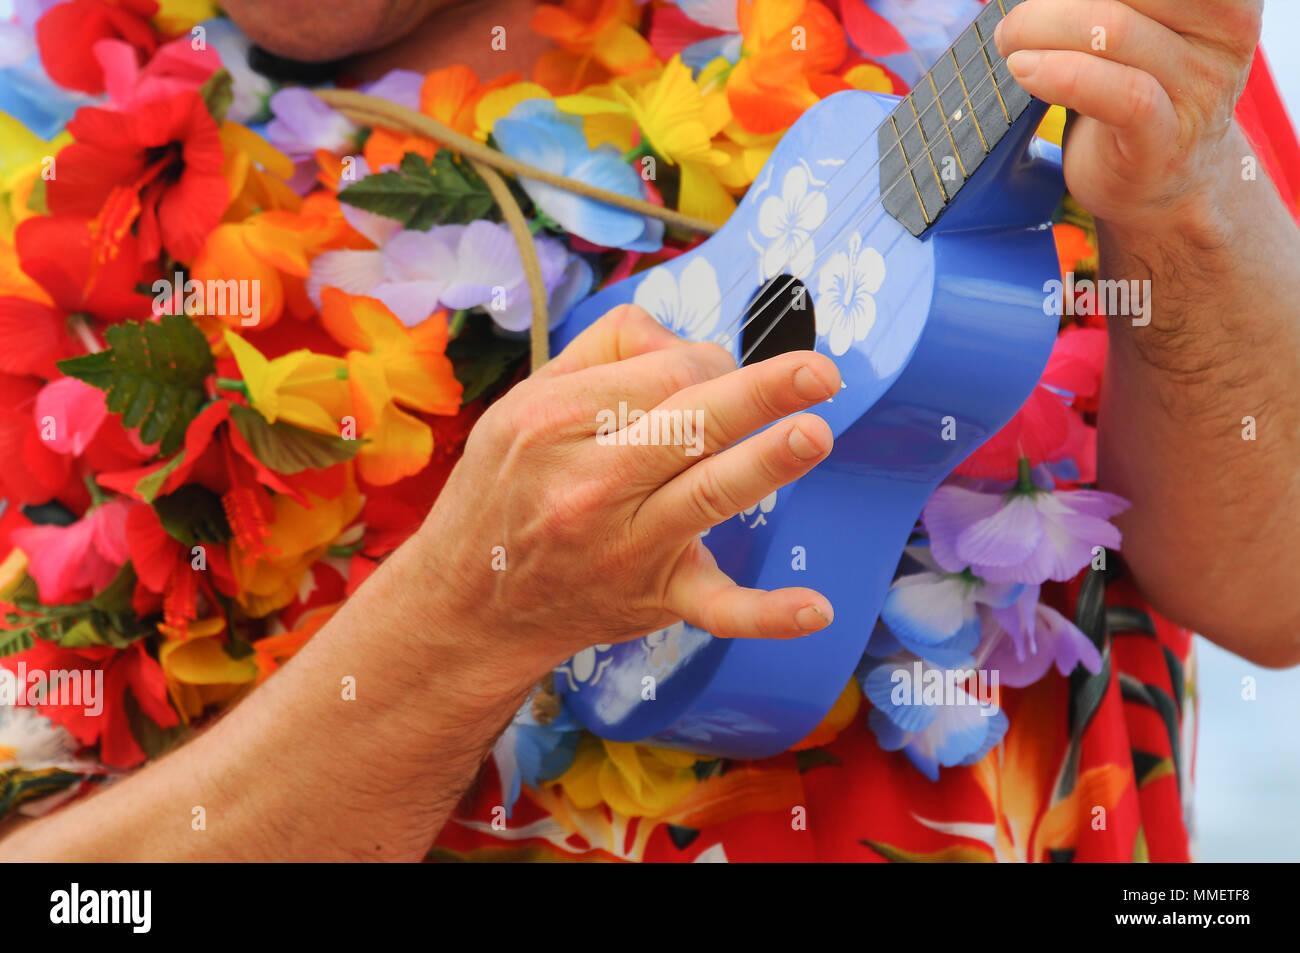 Man in bright floral Hawaiian shirt strumming a blue ukulele - Stock Image